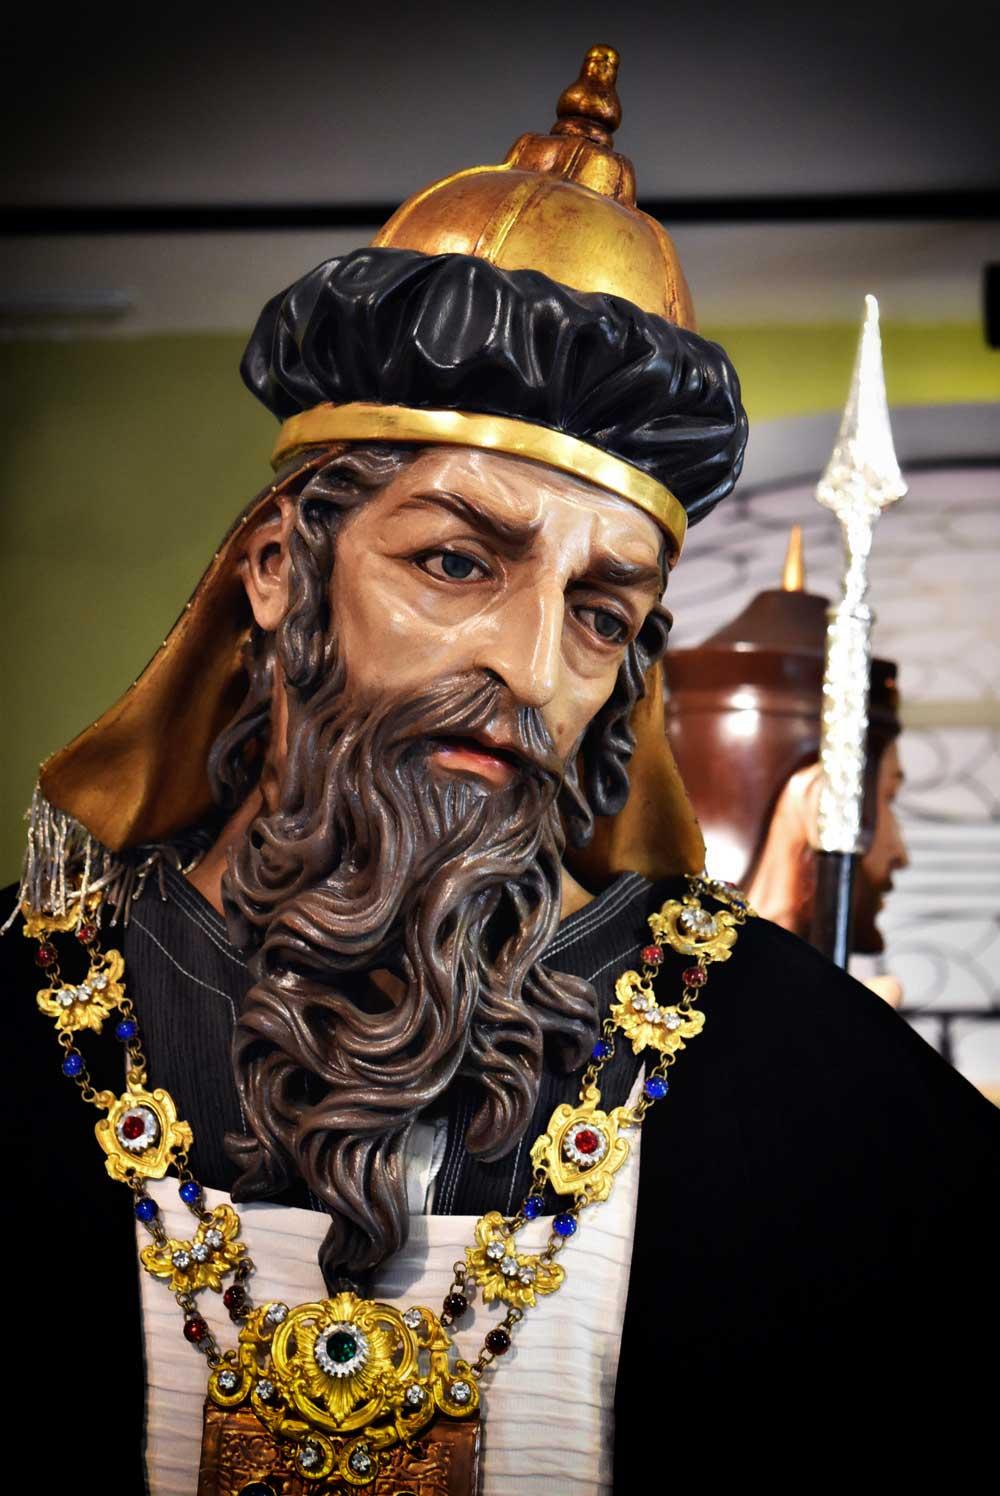 misterio-de-jesus-ante-anas-misterio-del-perdon-para-cordoba-1